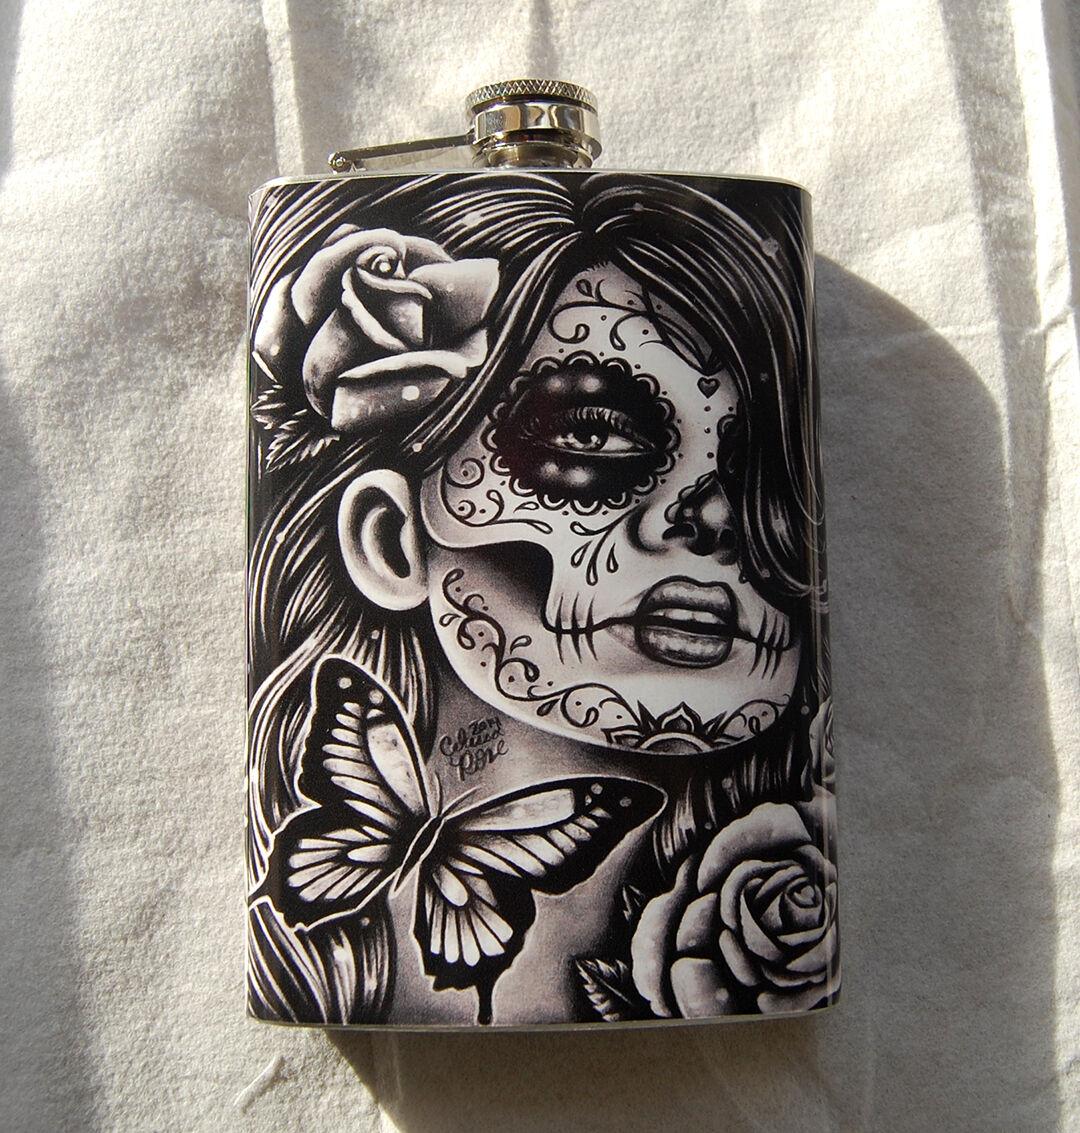 Calavera Tattoo Flash pretty sugar skull tattoo roses calavera rockabilly stainless steel 8oz  flask